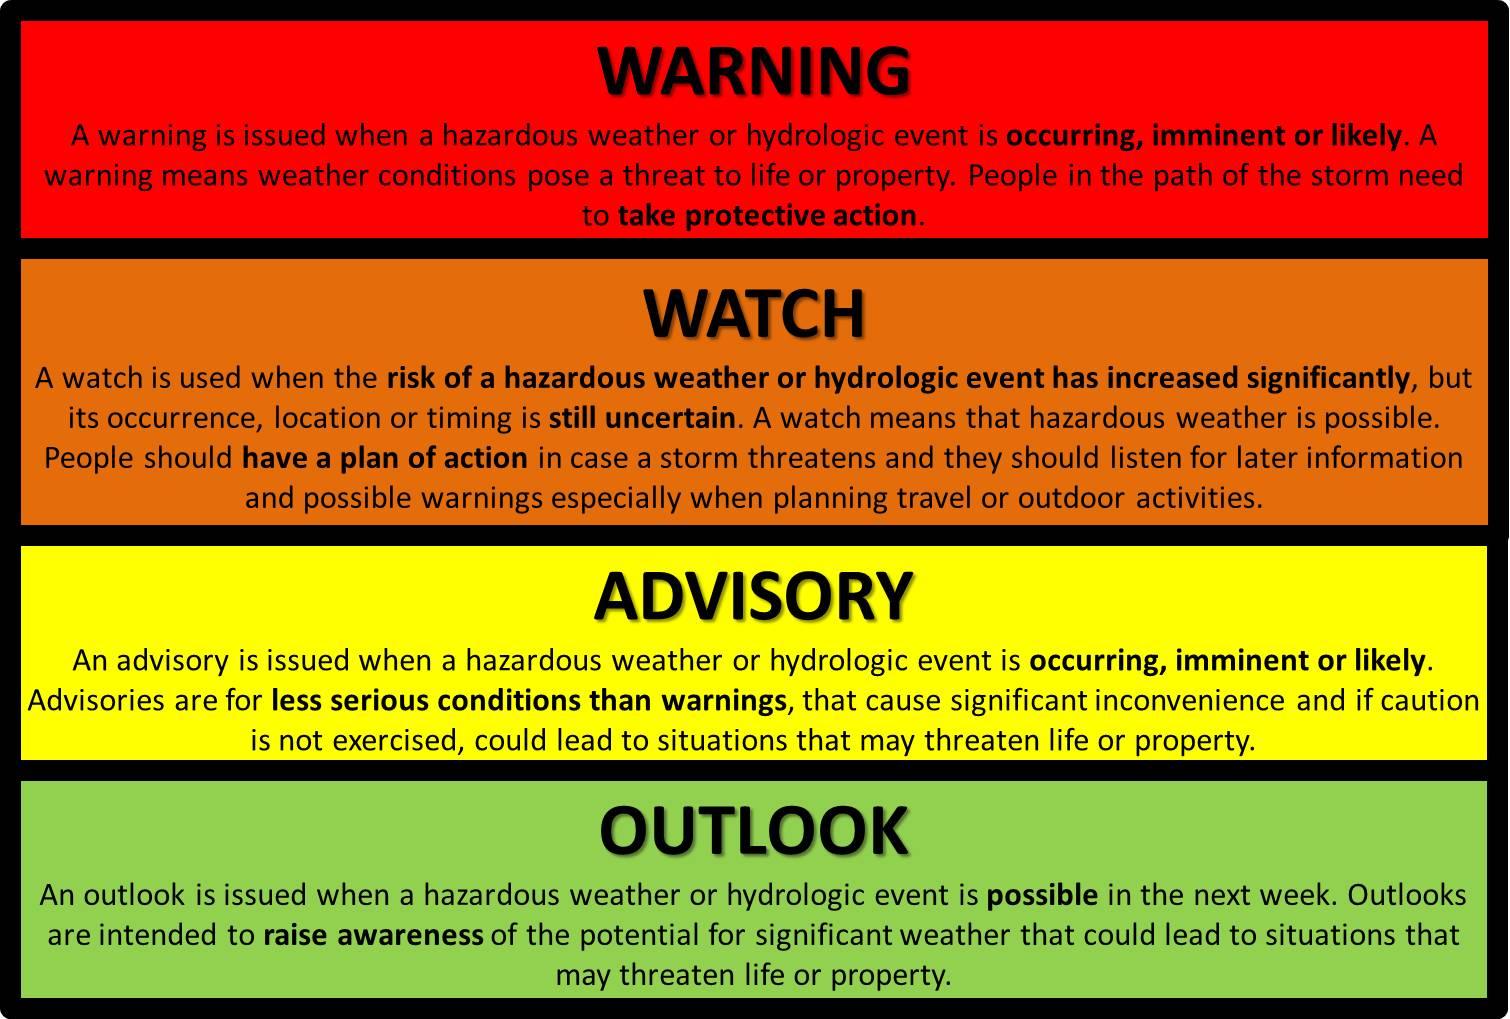 https://www.weather.gov/images/riw/Warning_Watch_Advisory_Outlook.jpg